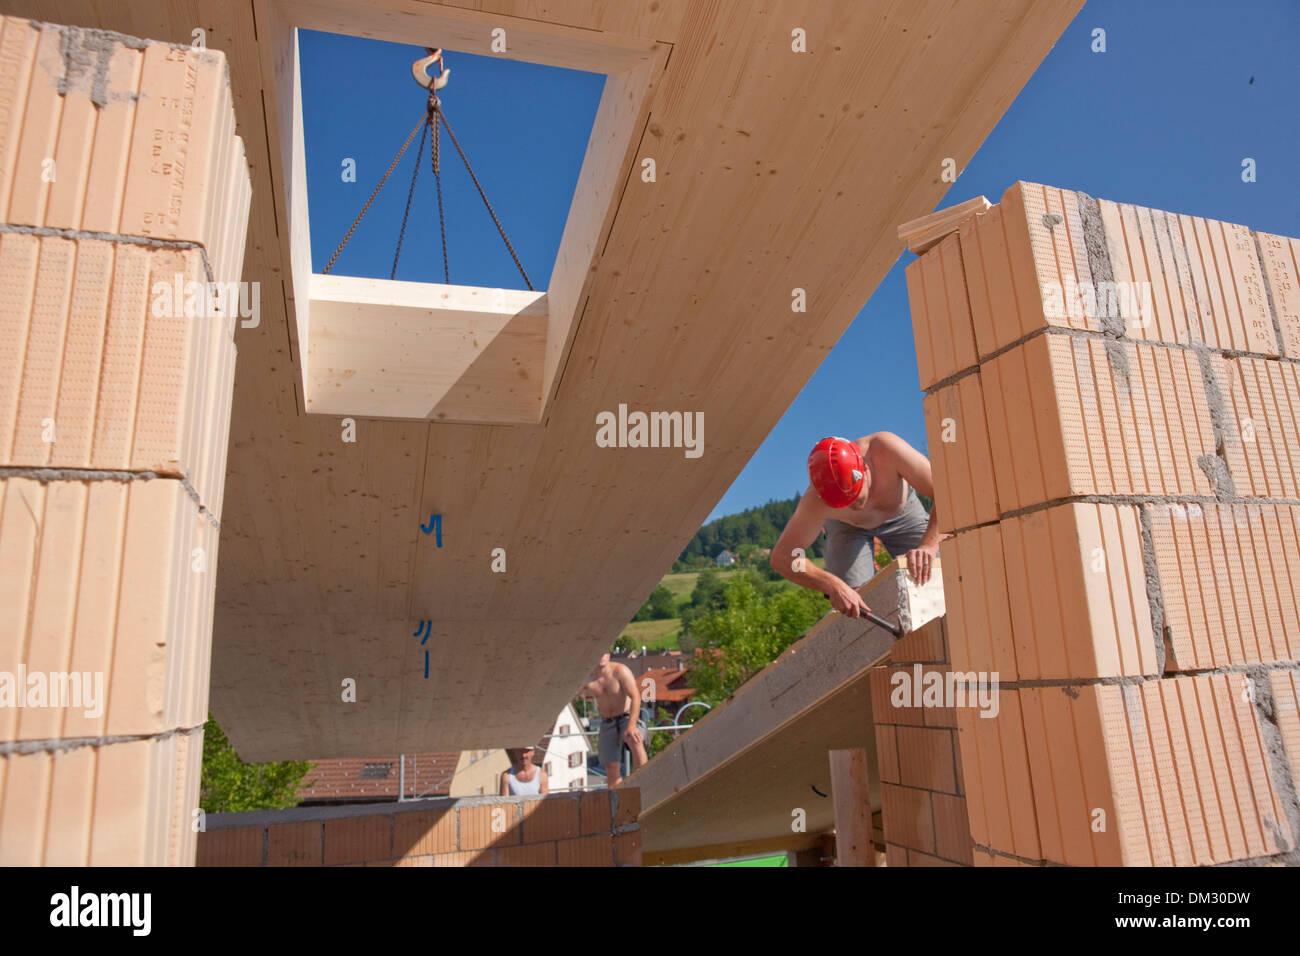 Schweiz Europa Fachwerk-Bau Holzbau Dach arbeiten Job Beruf Beruf Berufe Berufe Kanton Stockbild